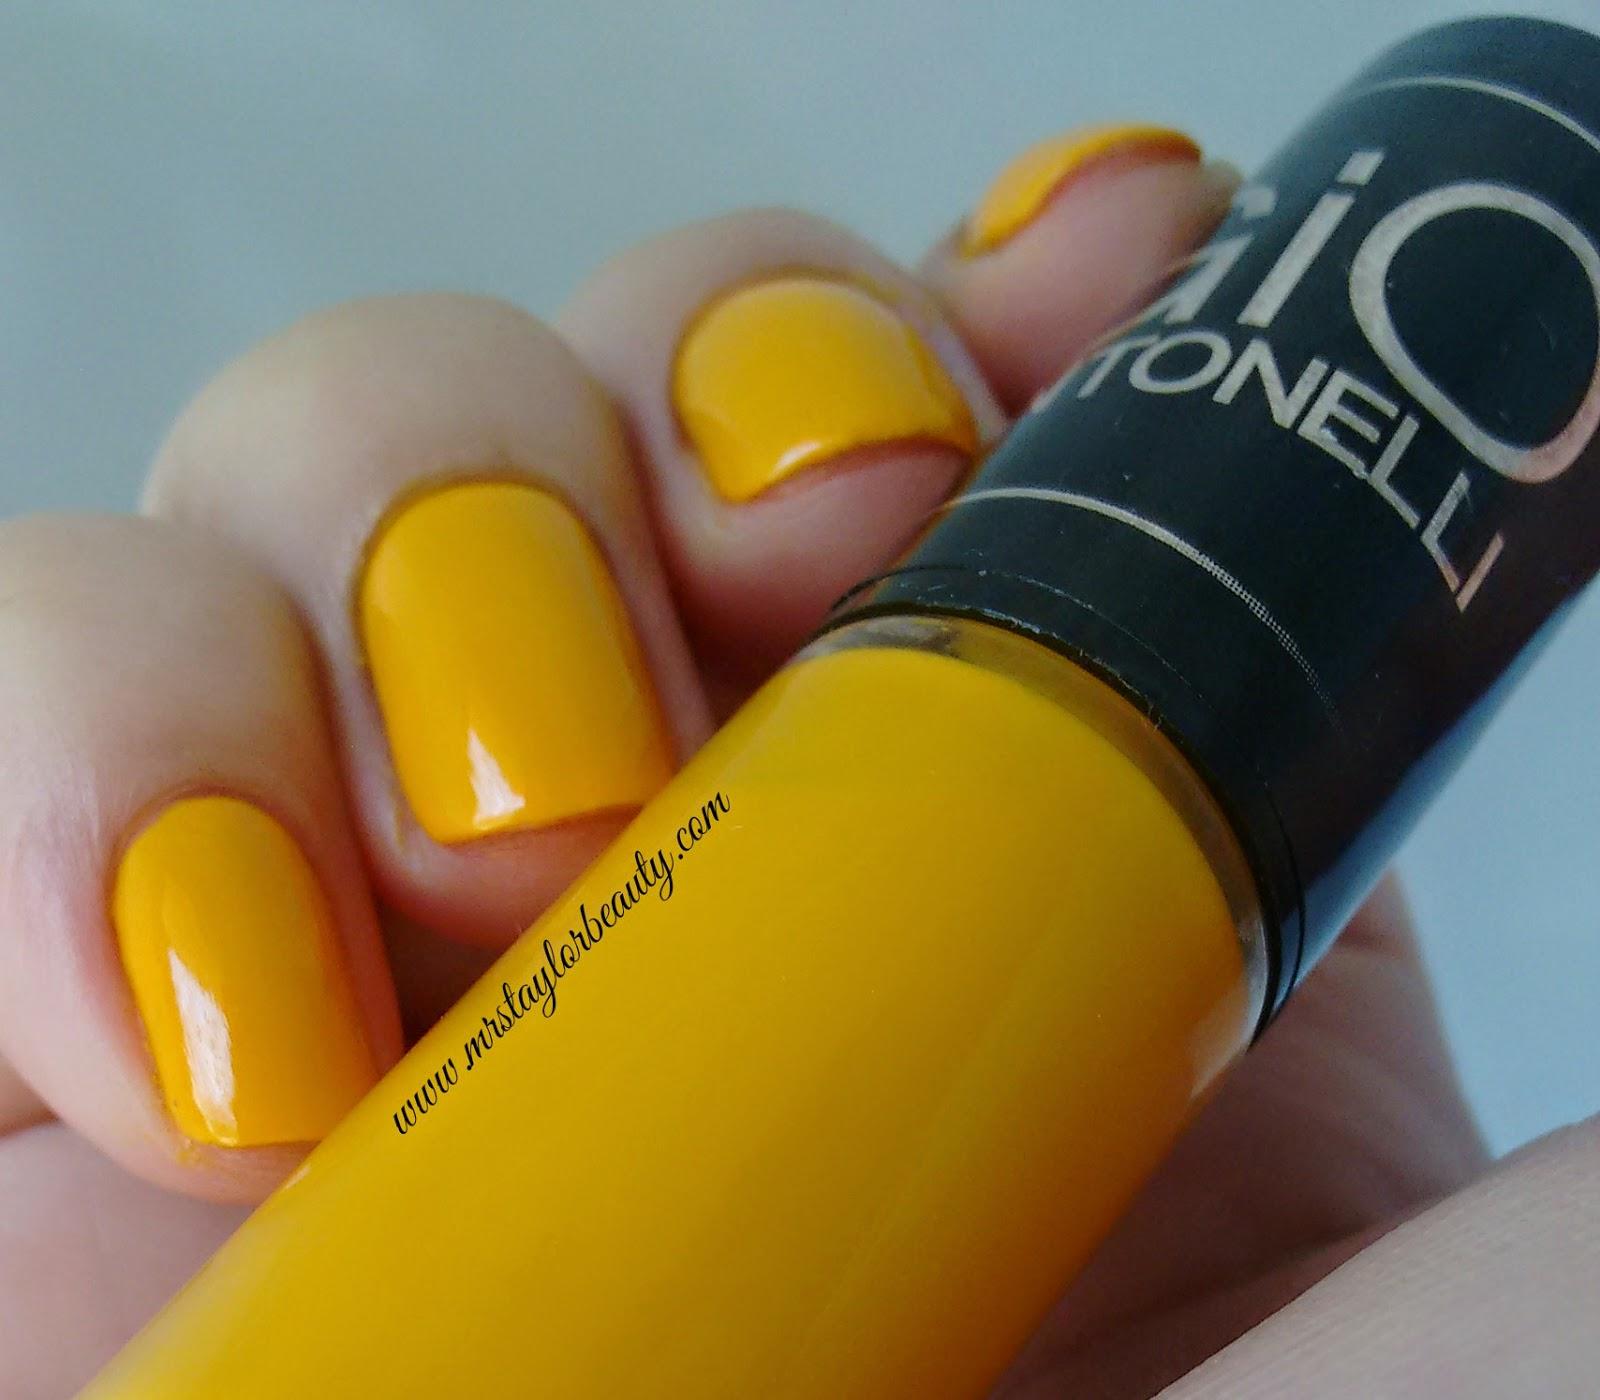 Esmalte, Gio Antonelli, Empolgação, Frescurites Femininas, Amarelo, Esmalte Amarelo, Yellow nail polish